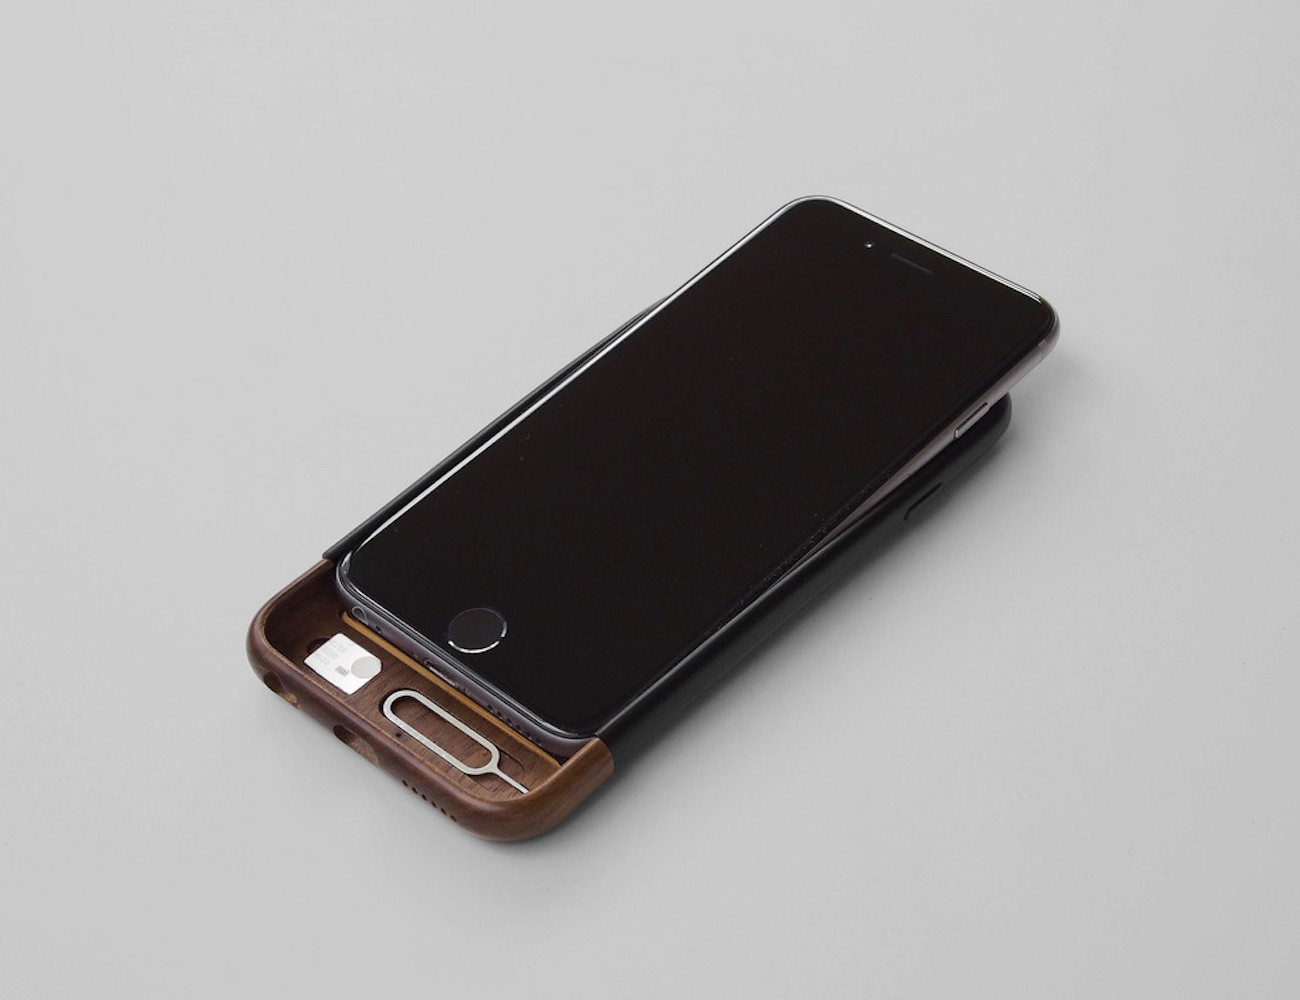 Convoy iPhone 6/6s Case in Walnut